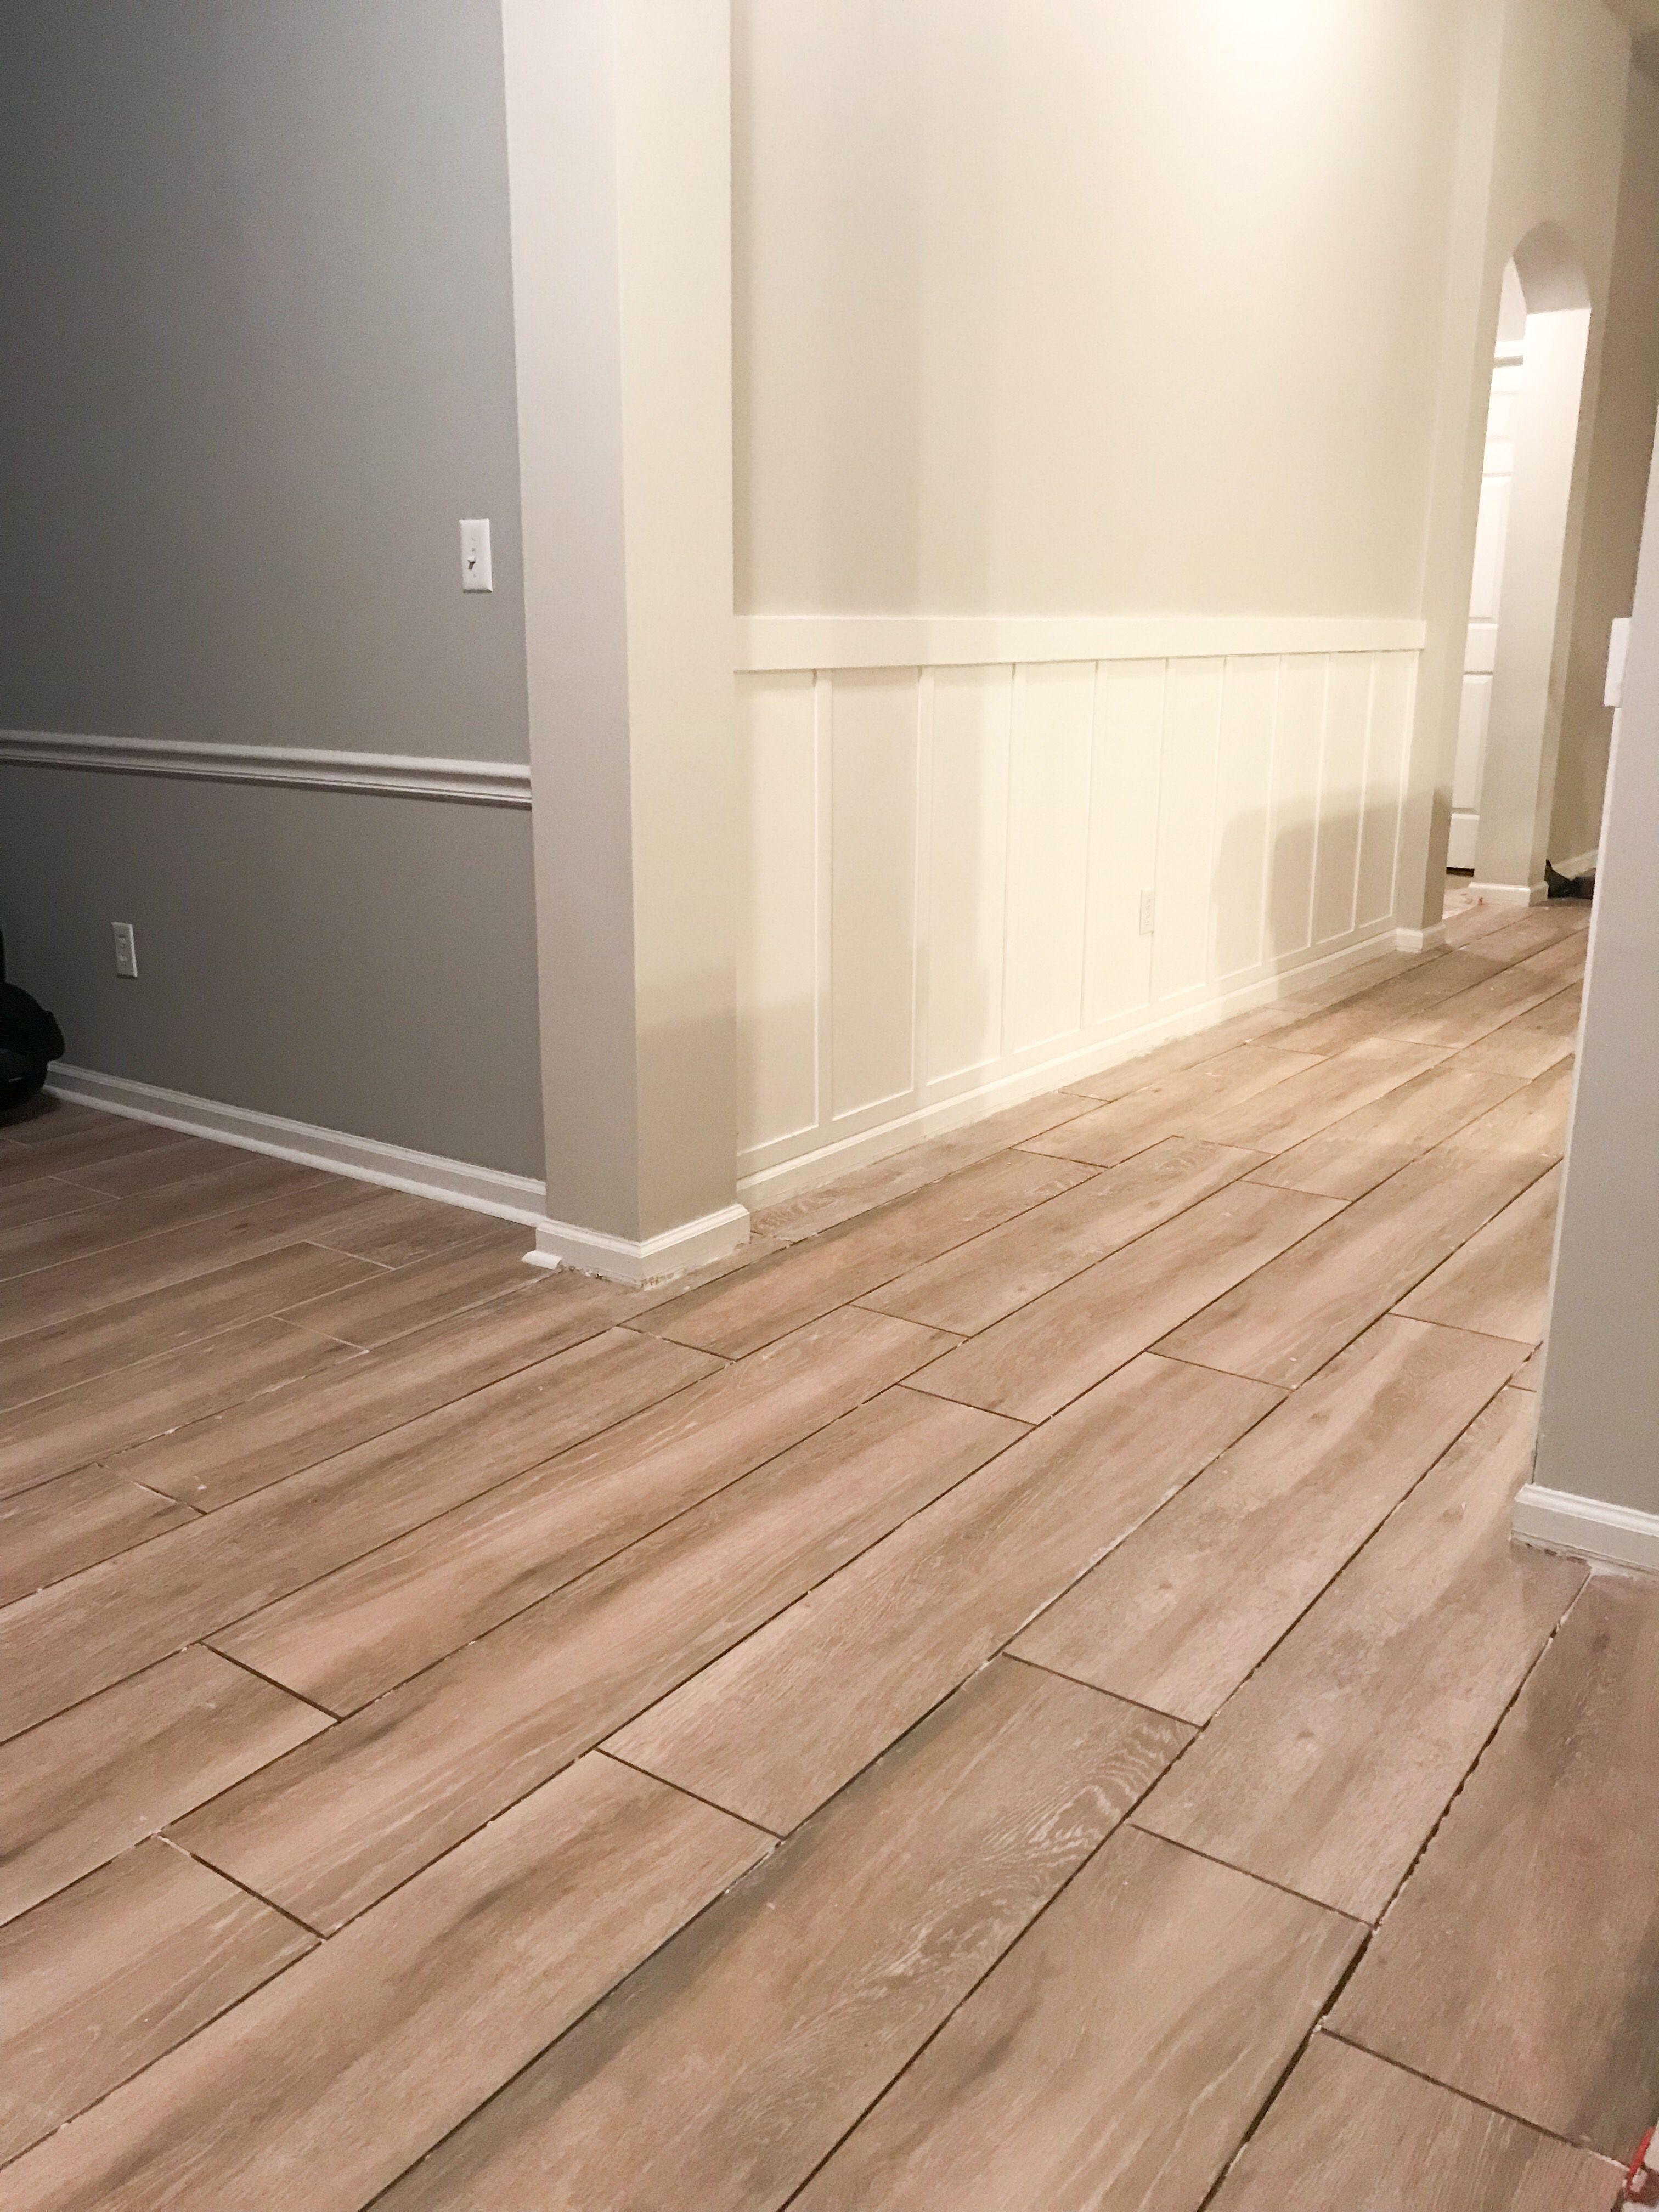 Hardwood Look Tile Floor Covering Assessments Absolute